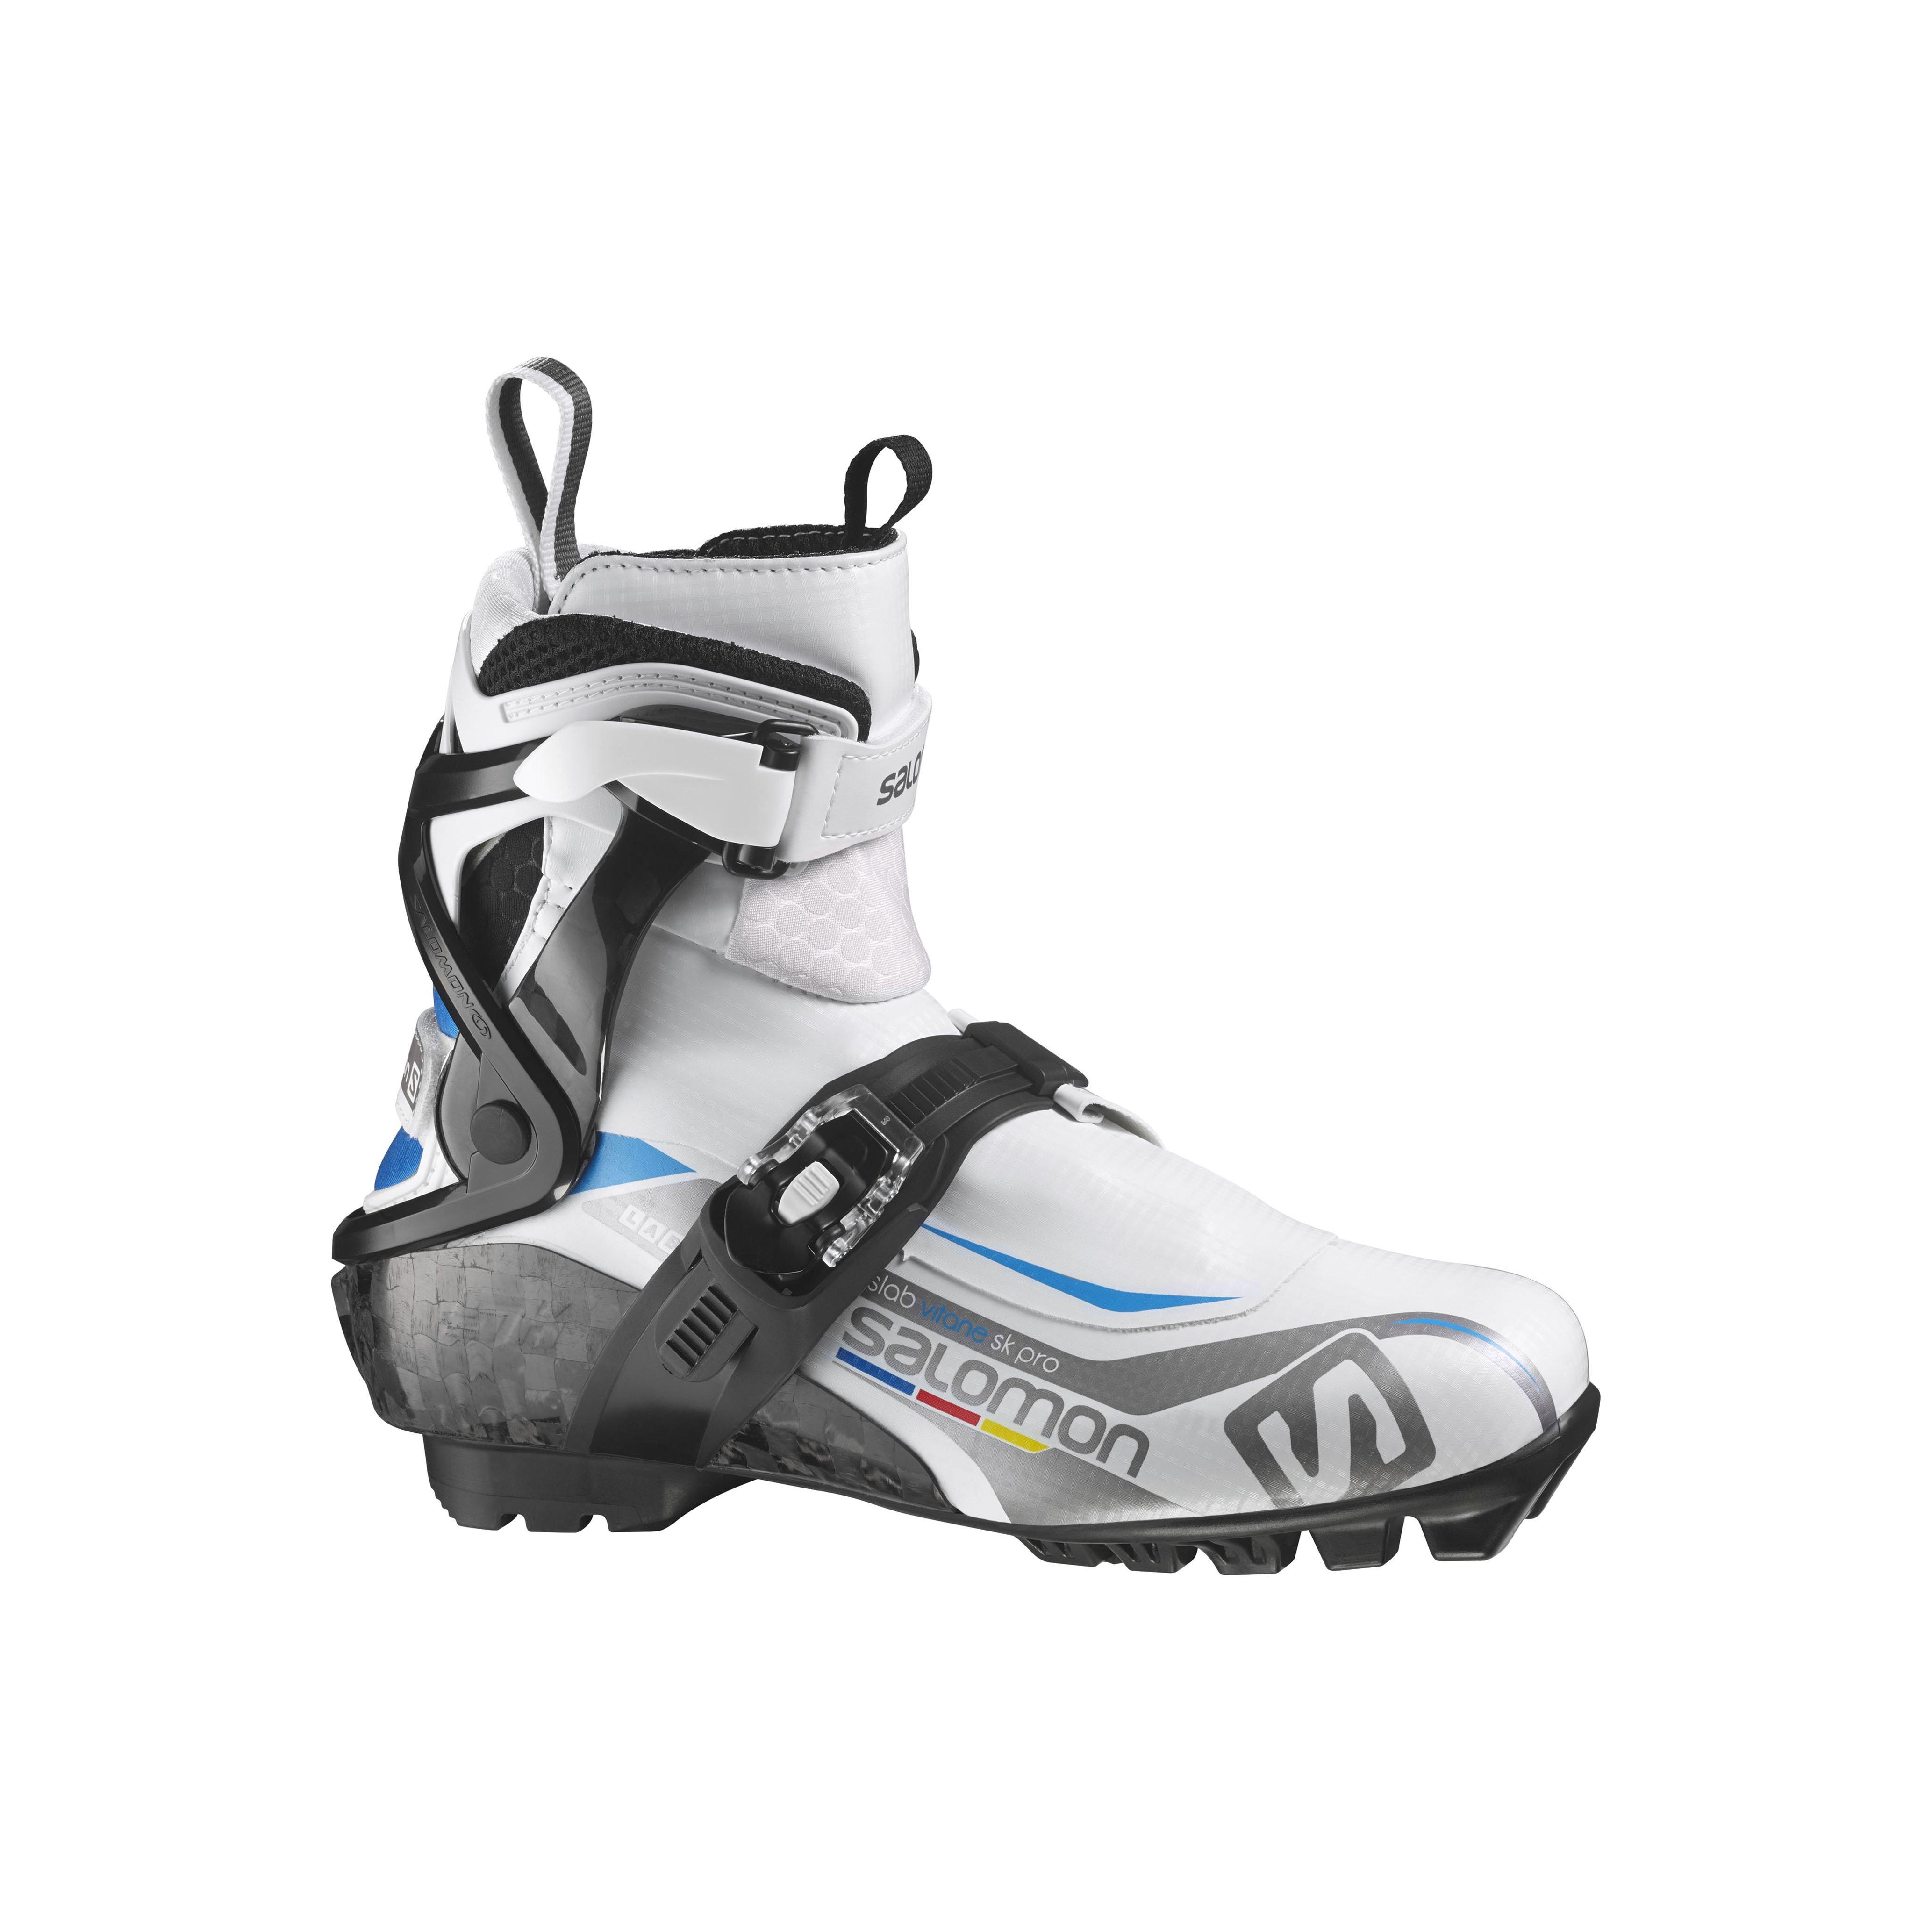 Salomon S-Lab Vitane Skate Pro White/Silver 16/17